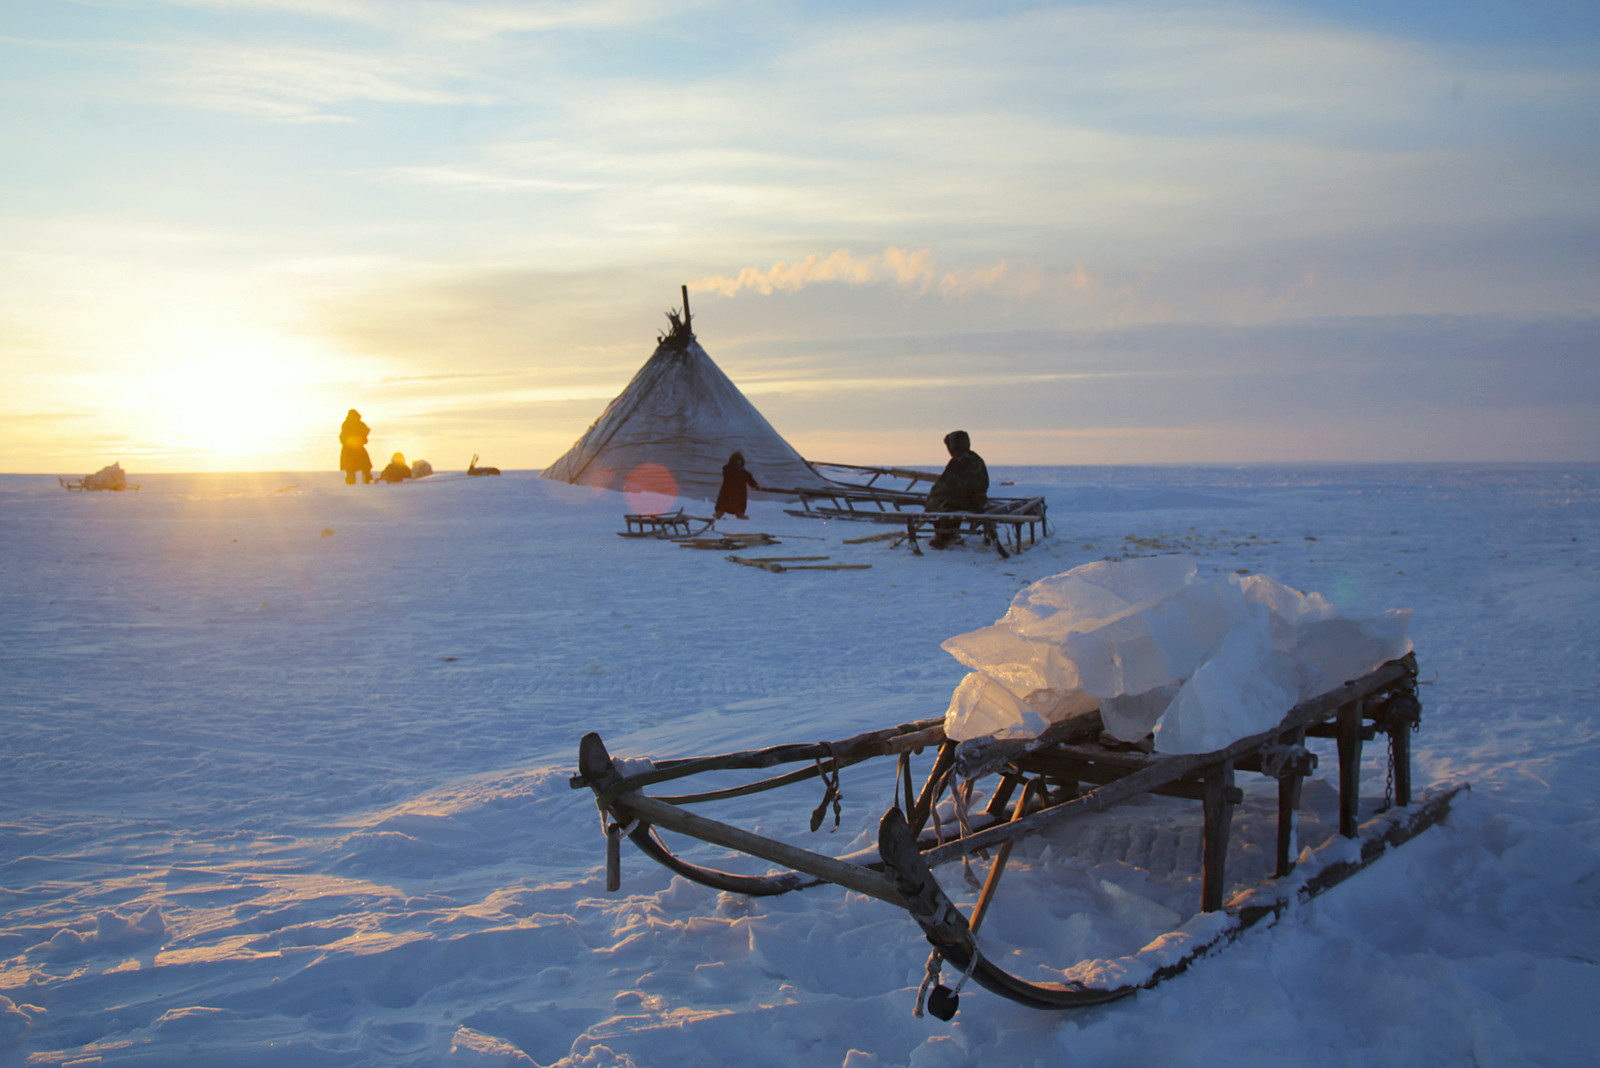 Pasokan es keluarga Nenet selama beberapa hari.